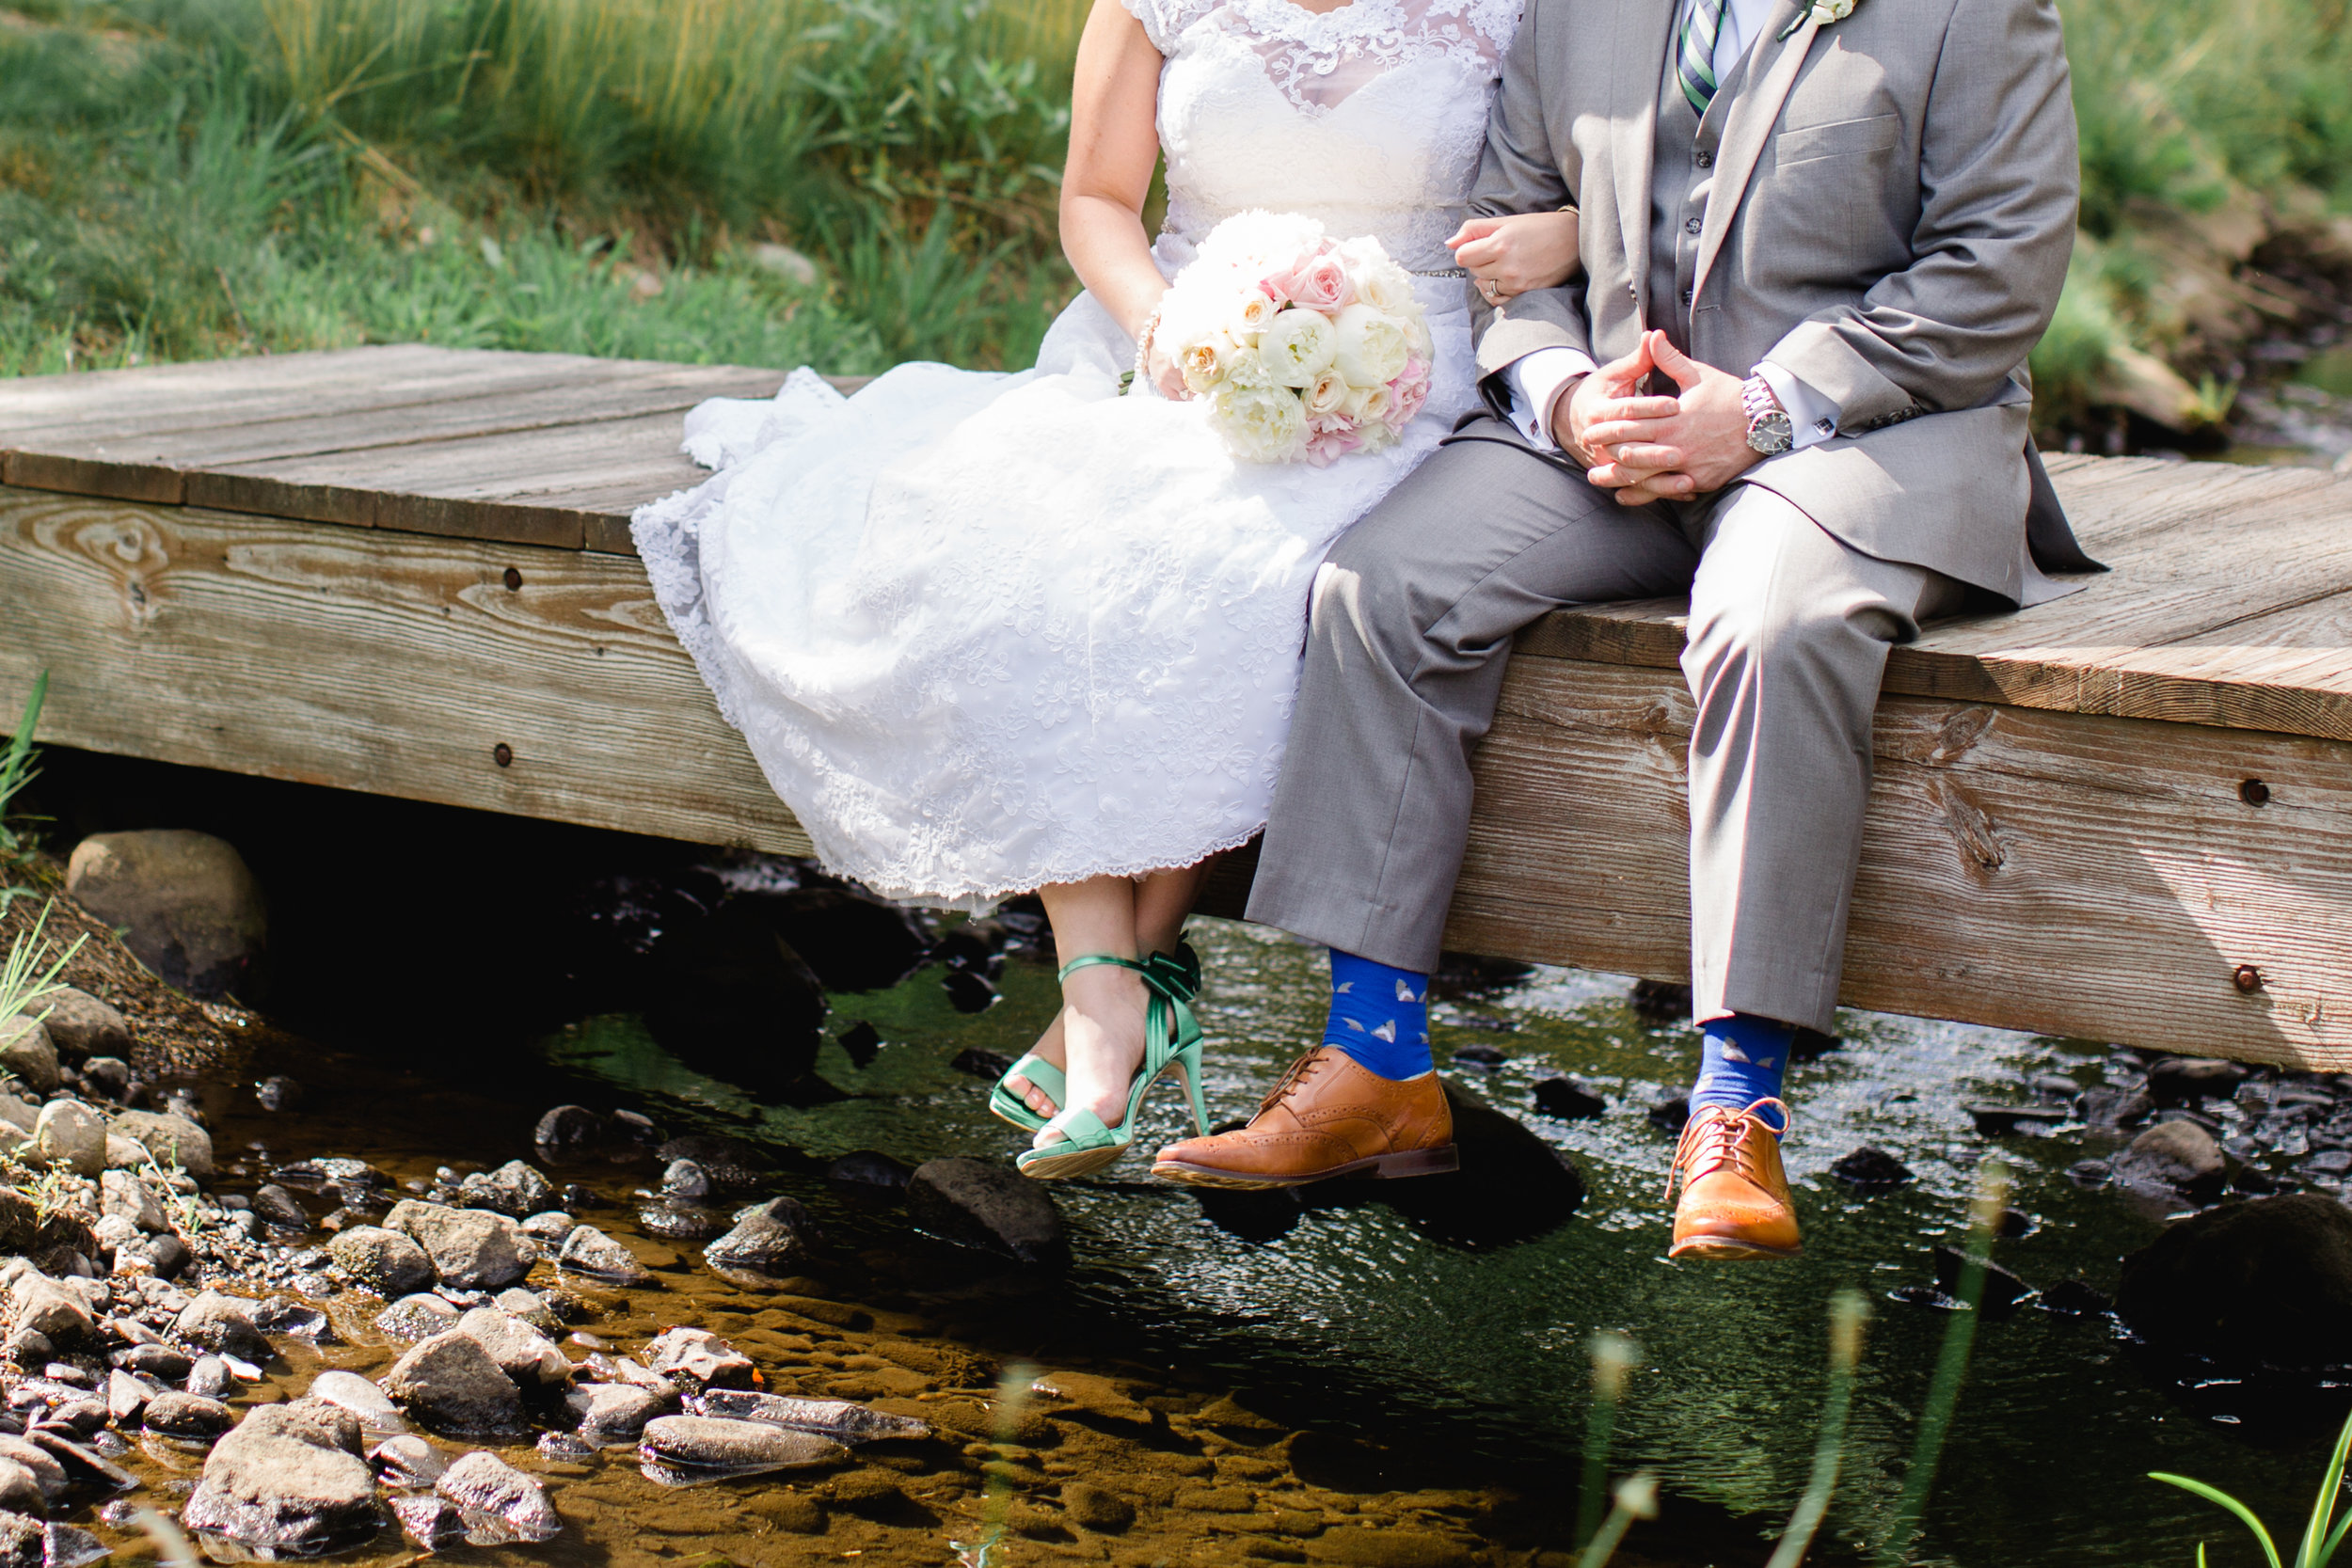 Glenmaura Country Club Scranton PA Wedding Photos_JDP-6458.jpg